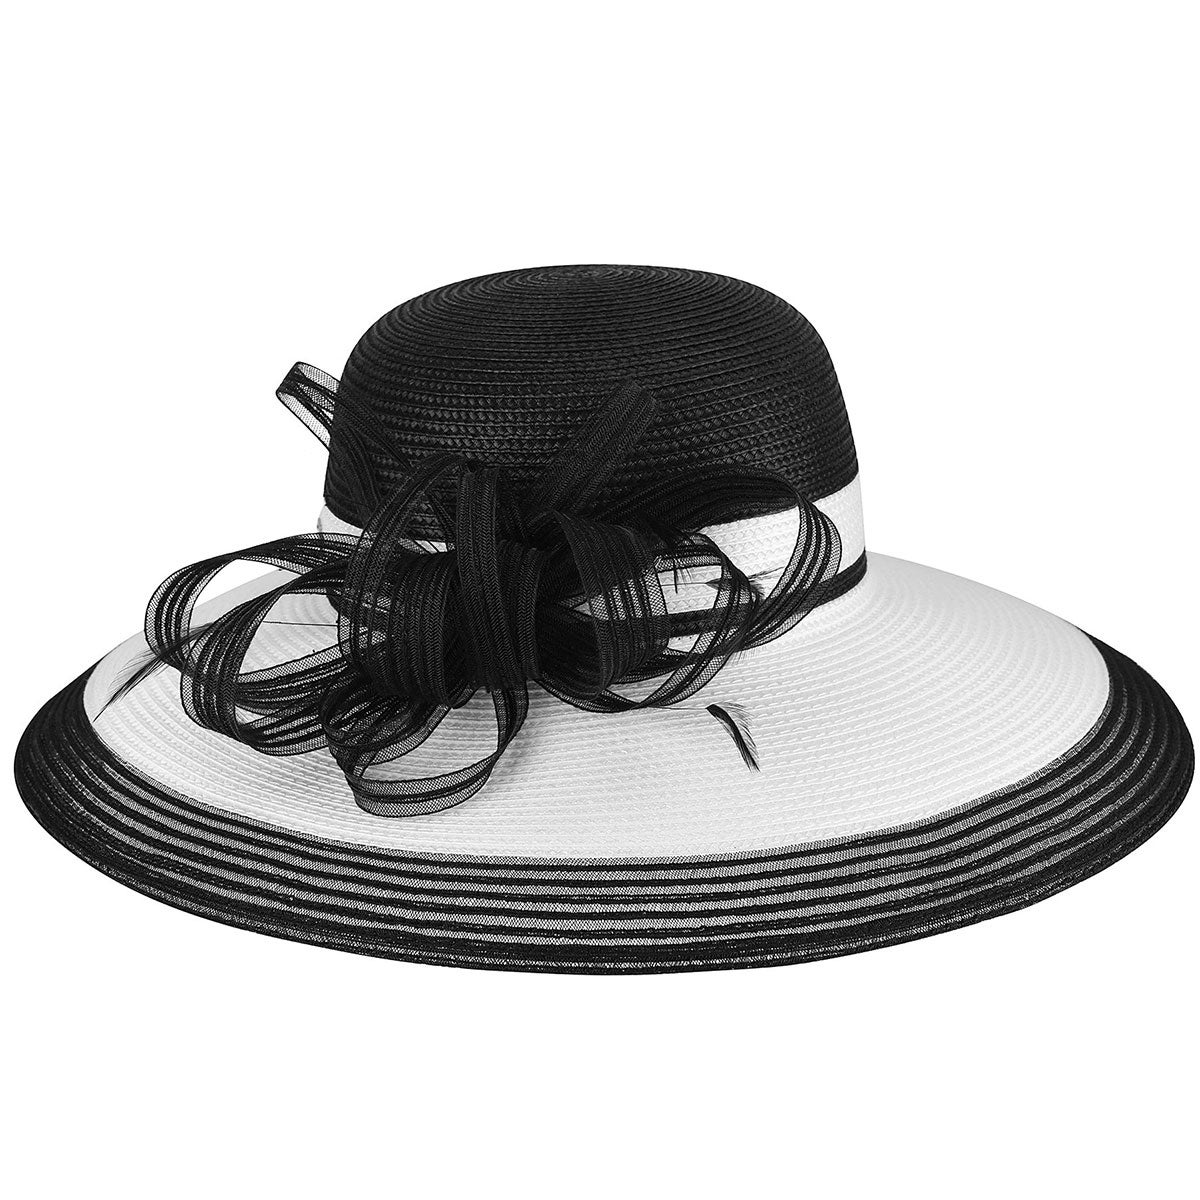 Betmar Barrymore Dress Hat in Black,White